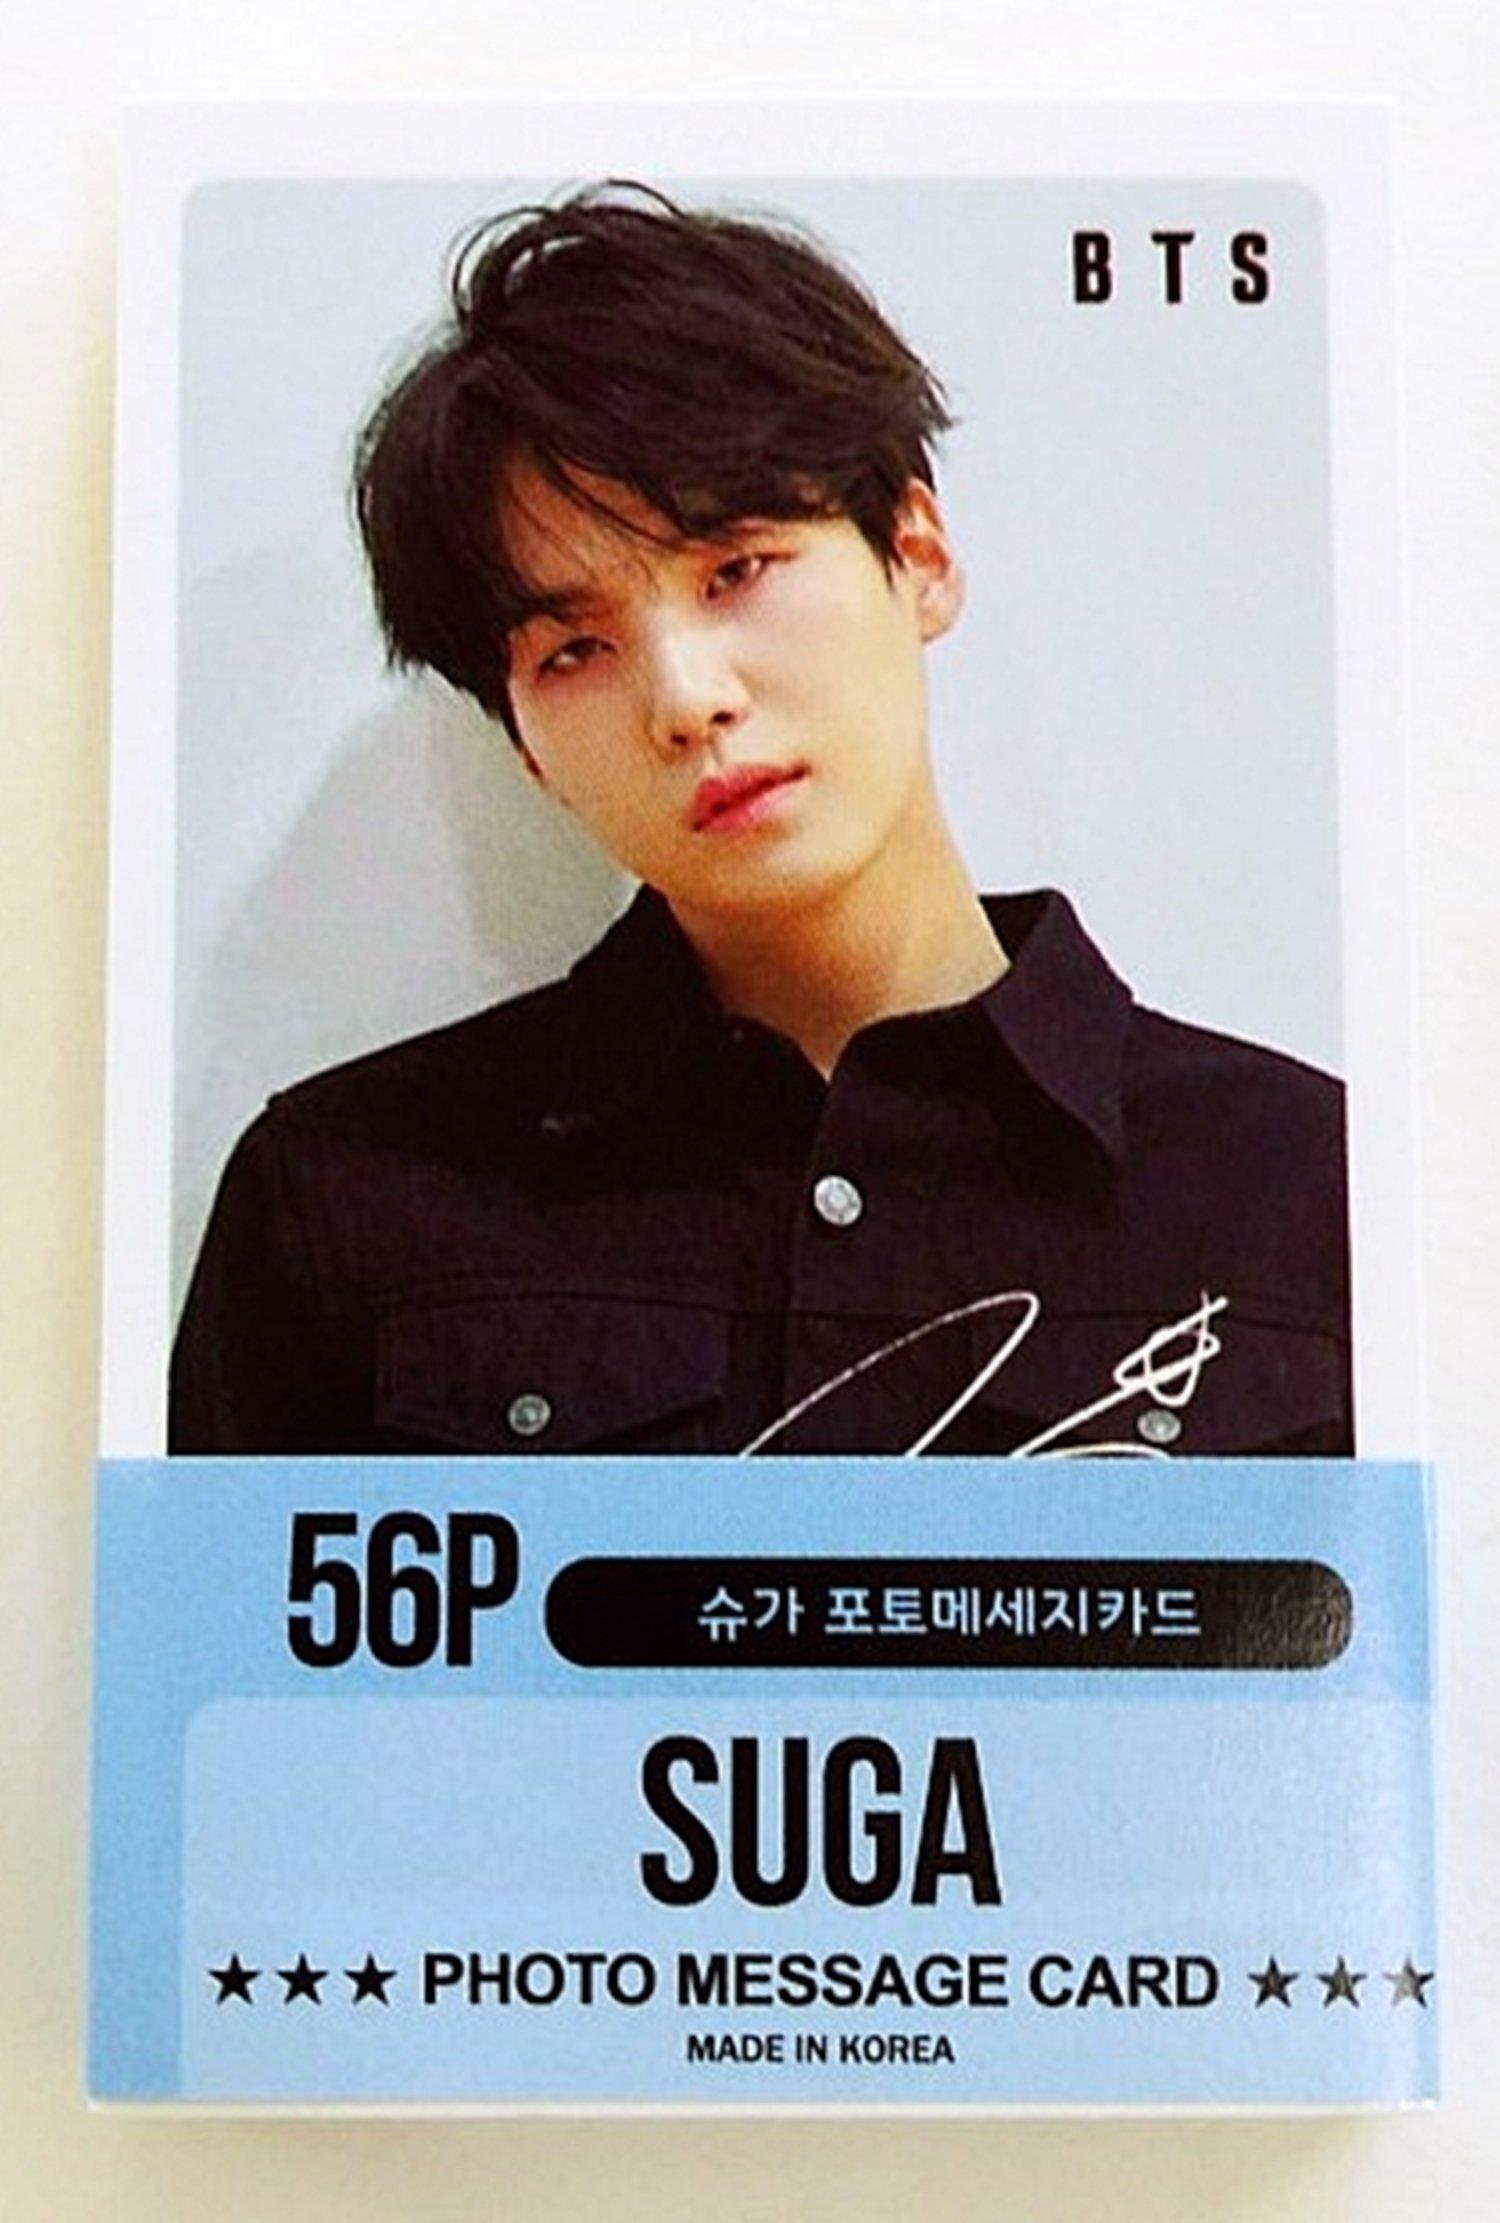 BTS - SUGA Solo Photocards 56pcs